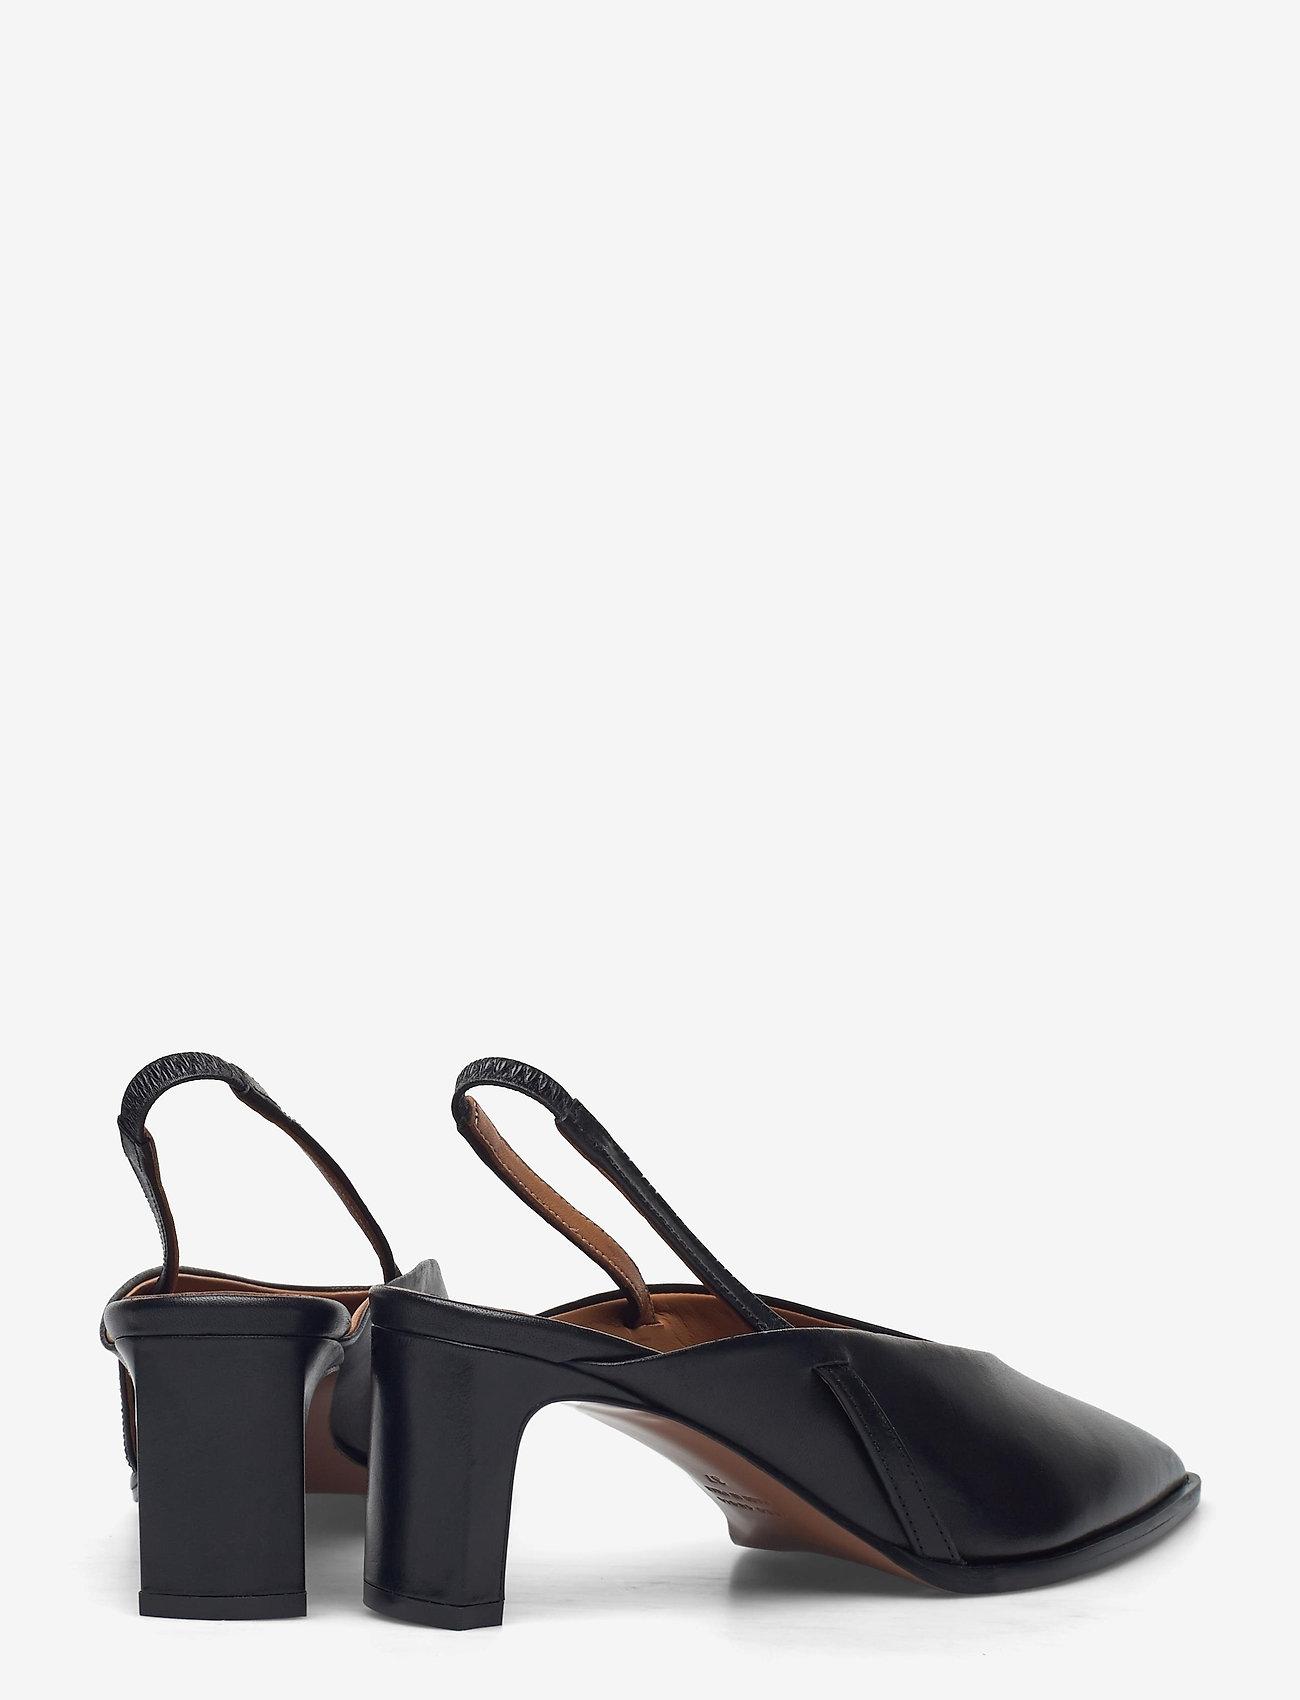 ATP Atelier - Capoiale Black Vacchetta - sling backs - black - 4